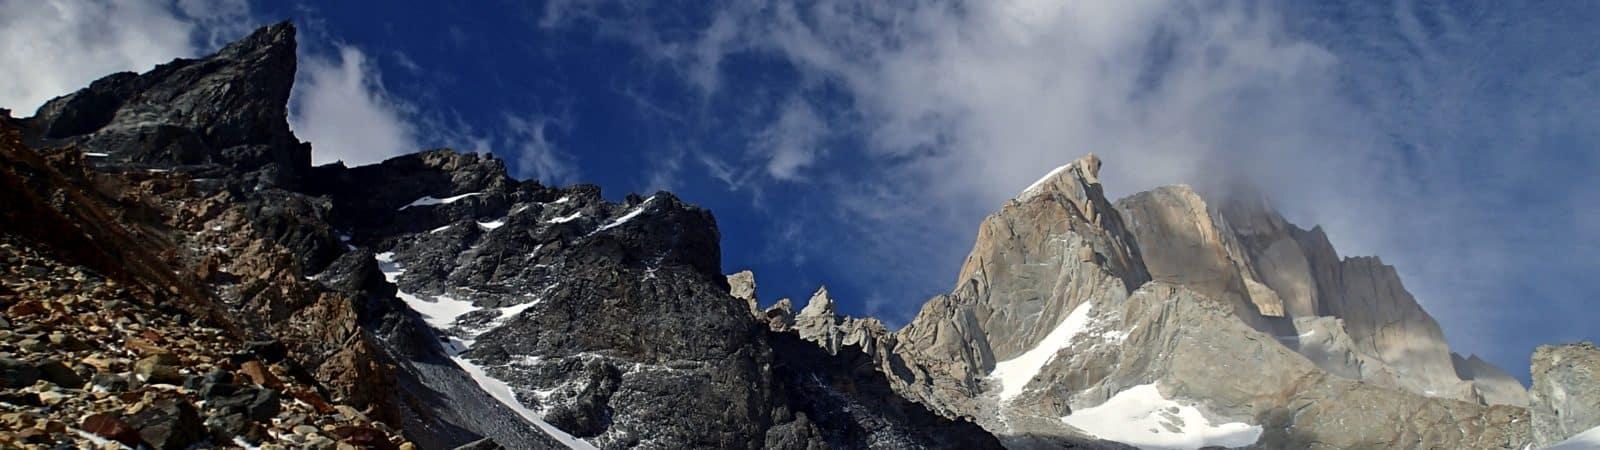 1+ day rock climbing trip in El Chaltén, Argentina